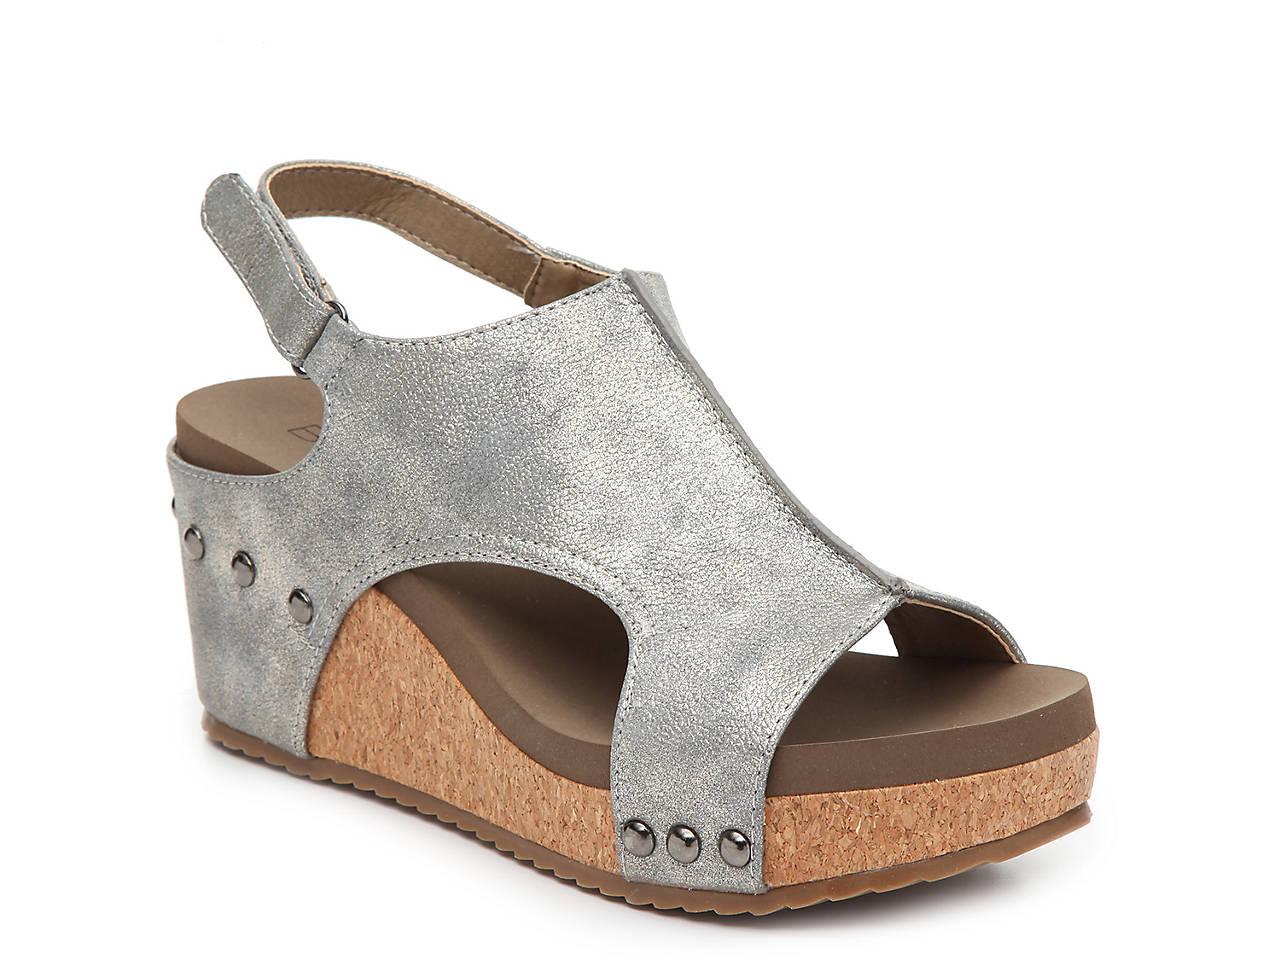 e1203b0764b9 Boutique by Corkys Ingrid Wedge Sandal Women s Shoes